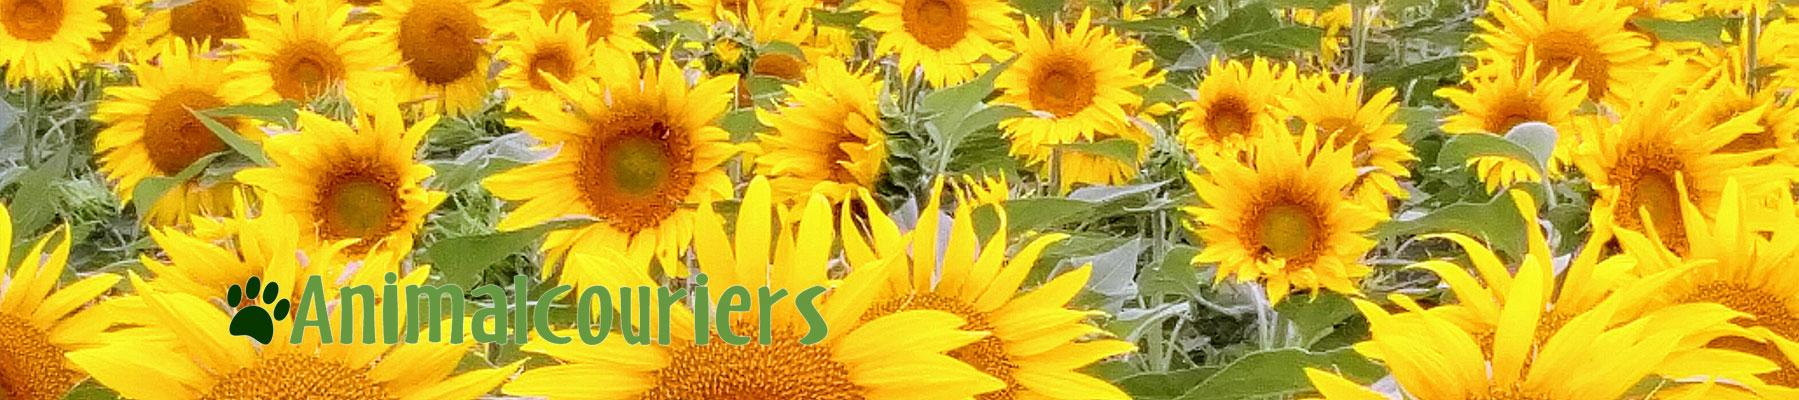 recent road trip sunflowers